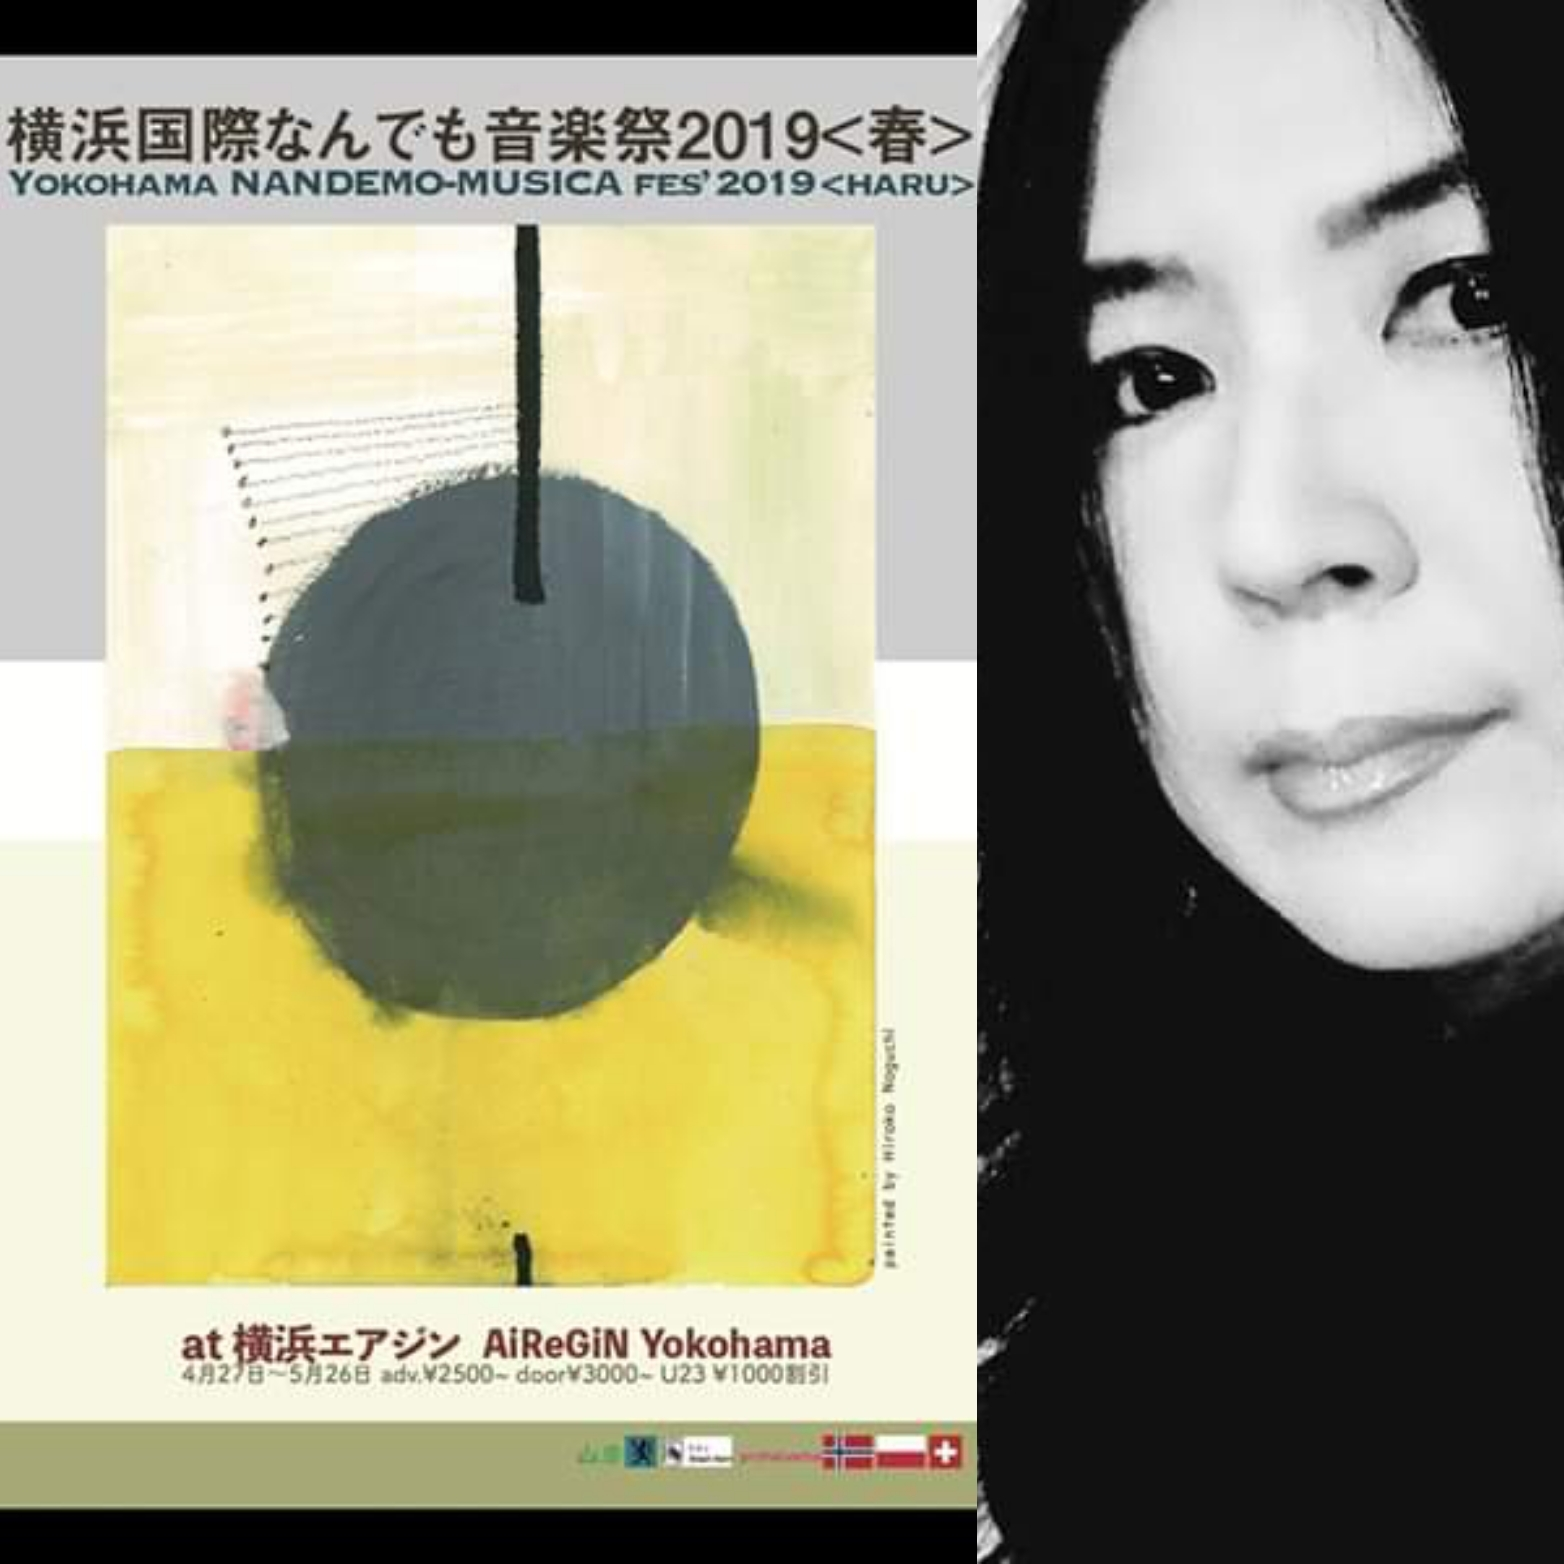 蜂谷真紀 Maki Hachiya 2019:5月~6月 live schedule_d0239981_14393251.jpg